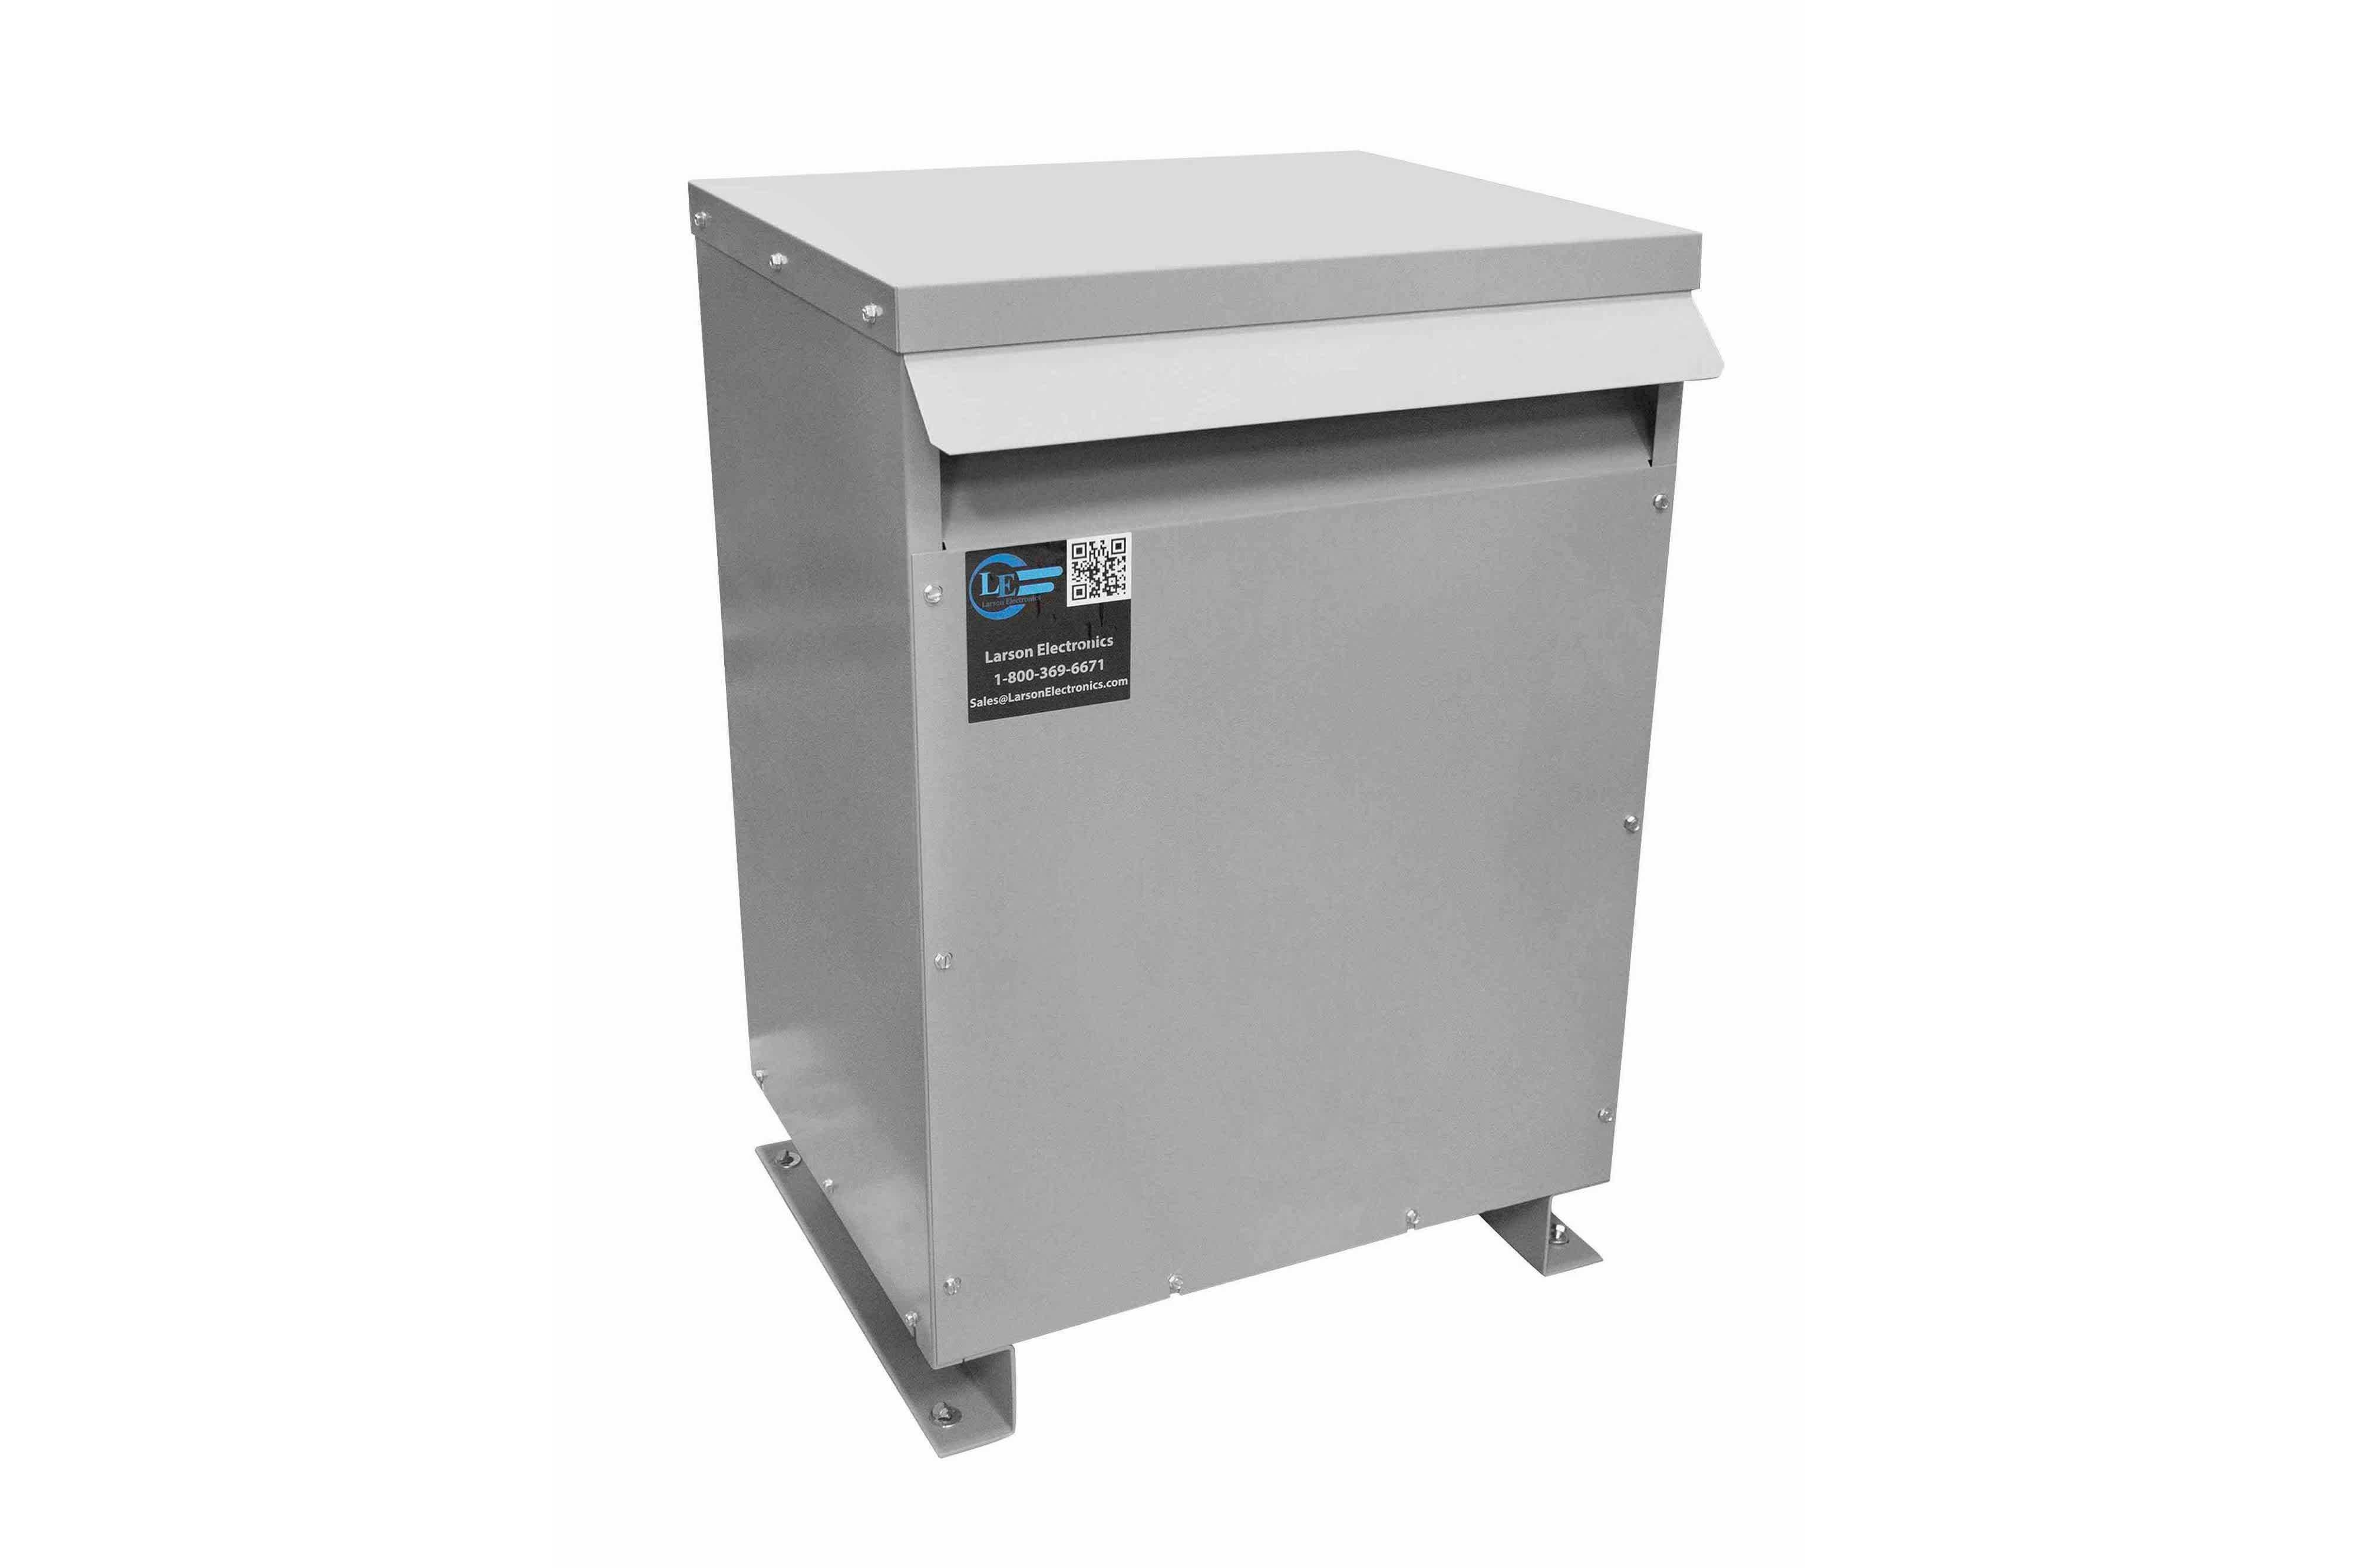 13 kVA 3PH Isolation Transformer, 380V Wye Primary, 600V Delta Secondary, N3R, Ventilated, 60 Hz